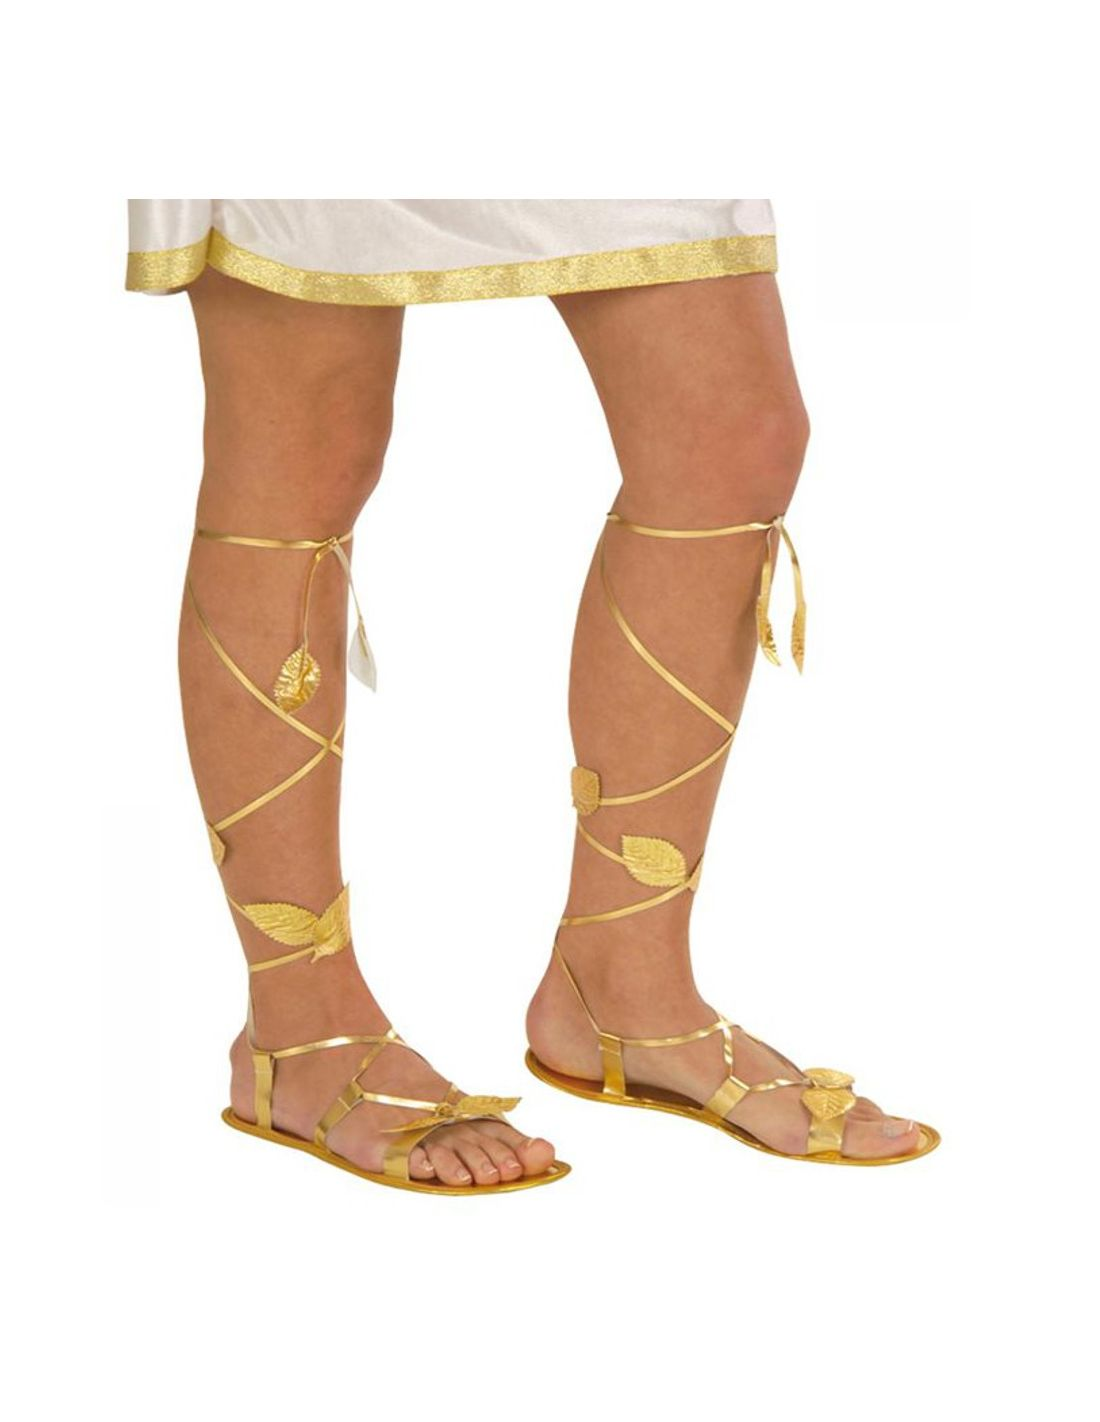 Mercad EgipciasTienda Online De O Sandalias Romanas Disfraces A3R54jL